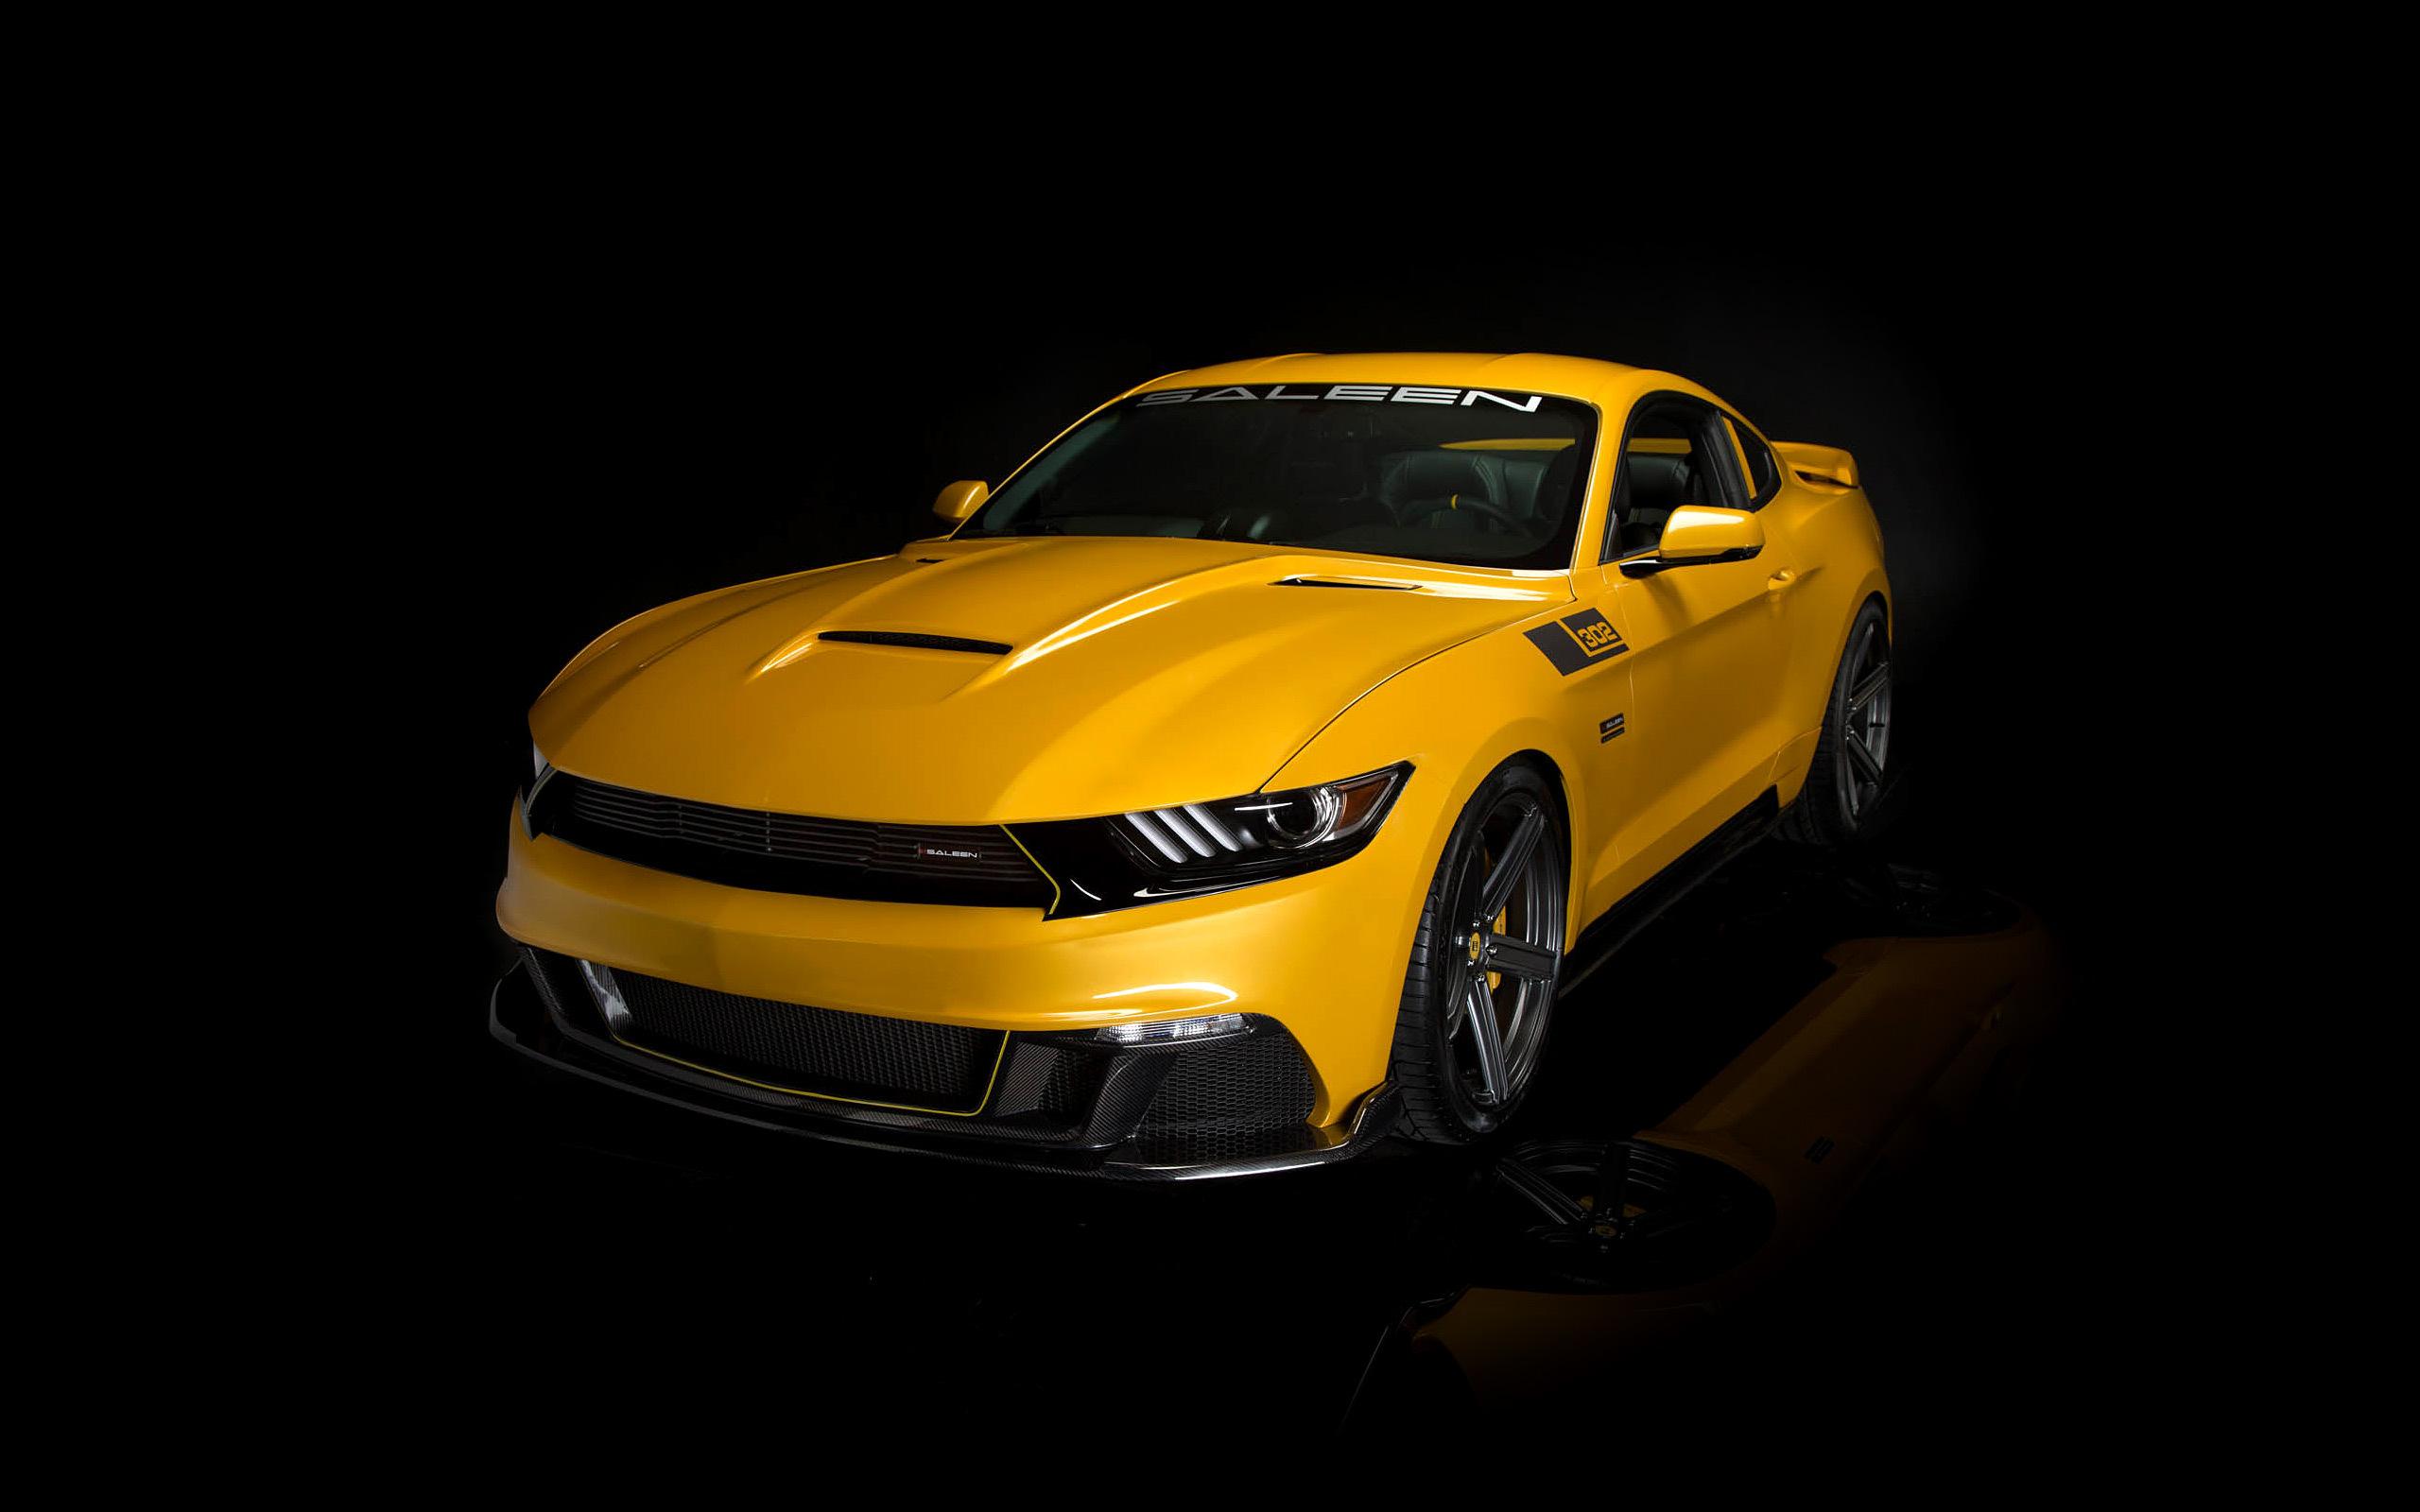 4k Uhd Wallpapers Of Cars 2015 Saleen Mustang S302 Black Label Wallpaper Hd Car